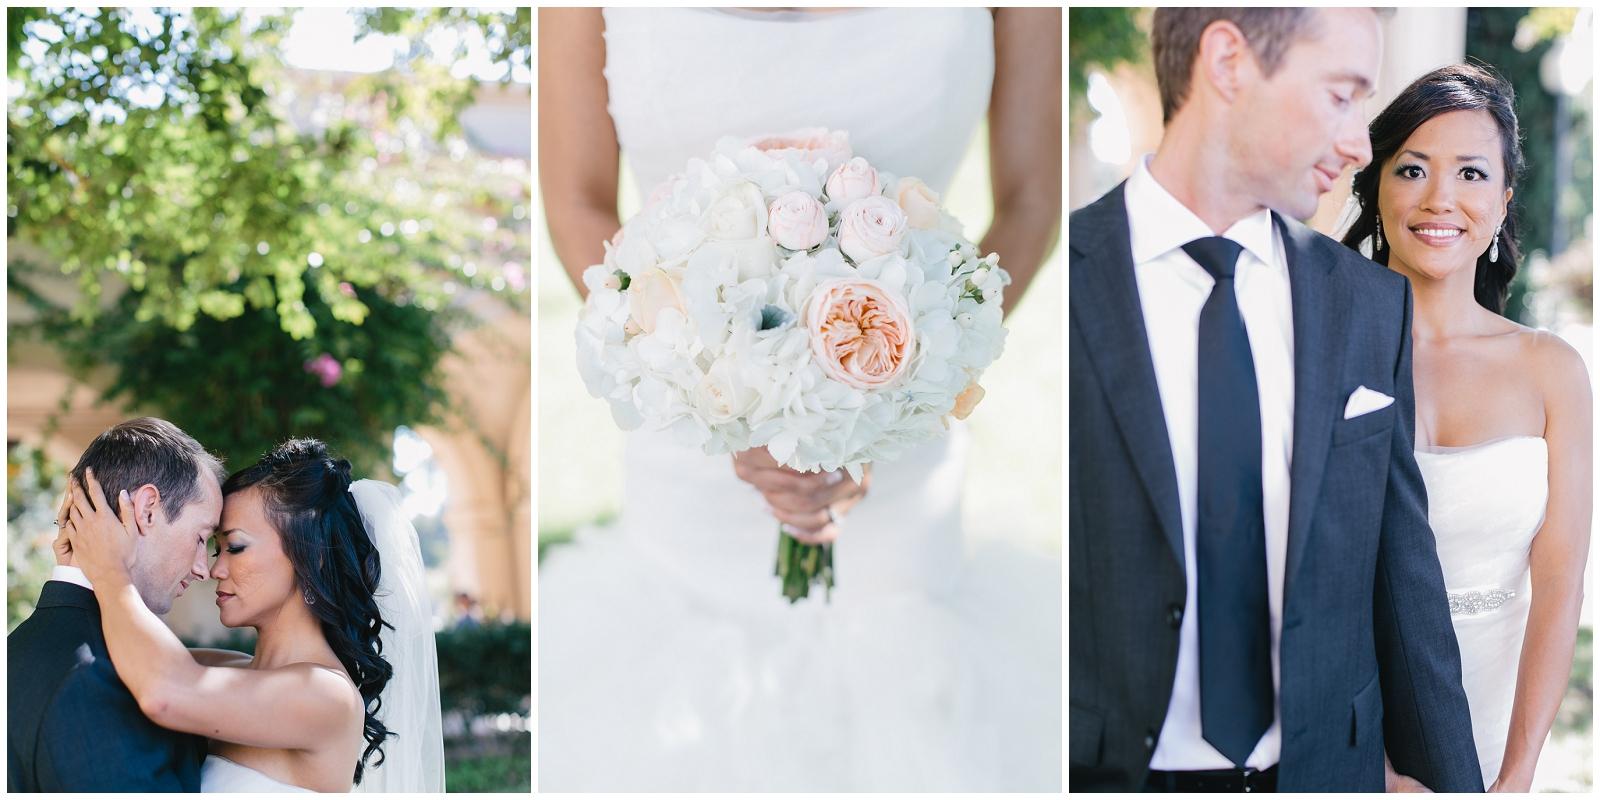 San-Francisco-Bay-Area-Wedding-Photography-Destination-10.jpg